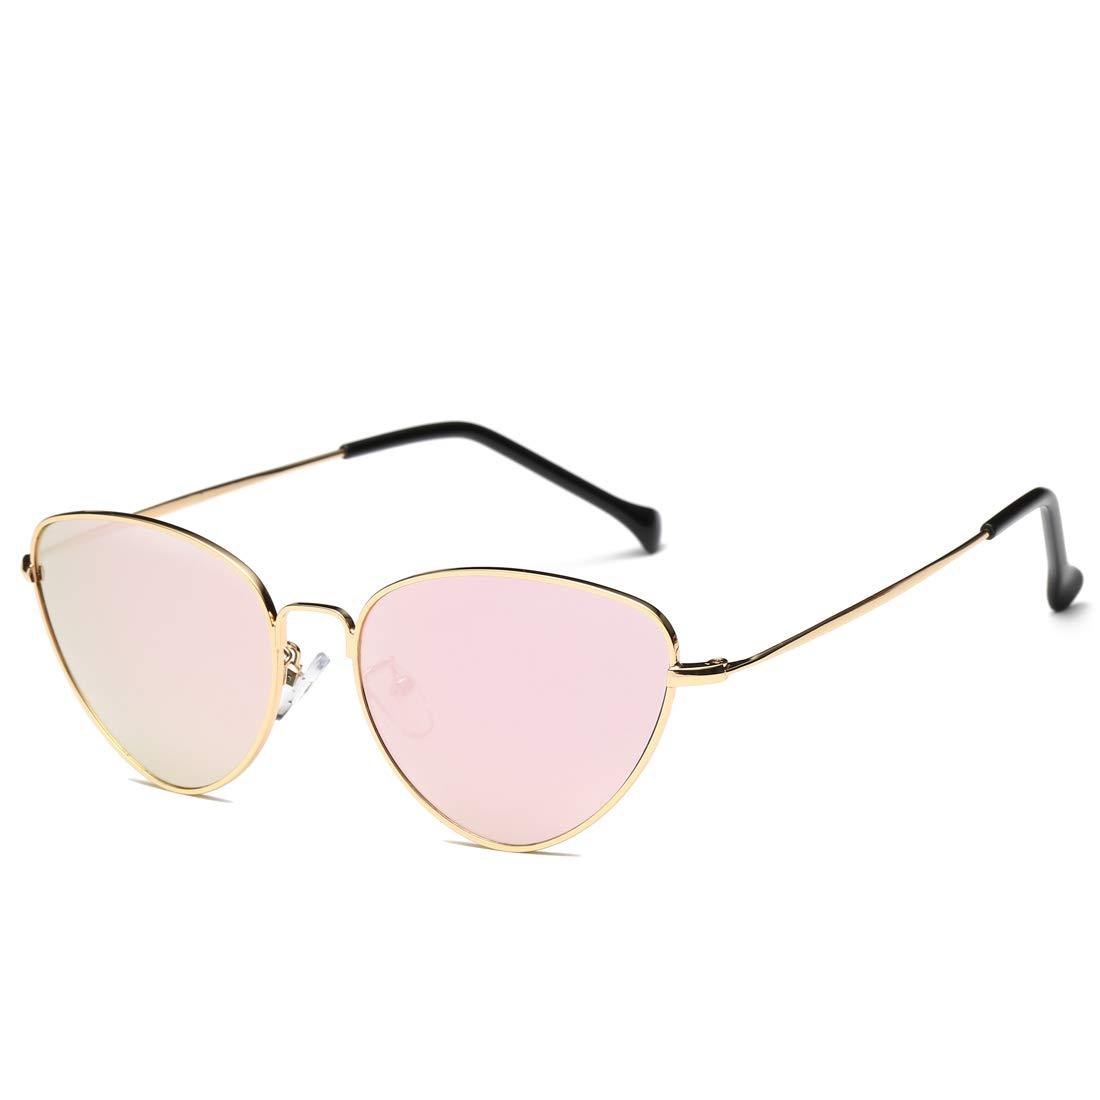 New Metal Cat Eye American Fashion Unisex Personalities Colorful Films Sea Glasses Sunglasses